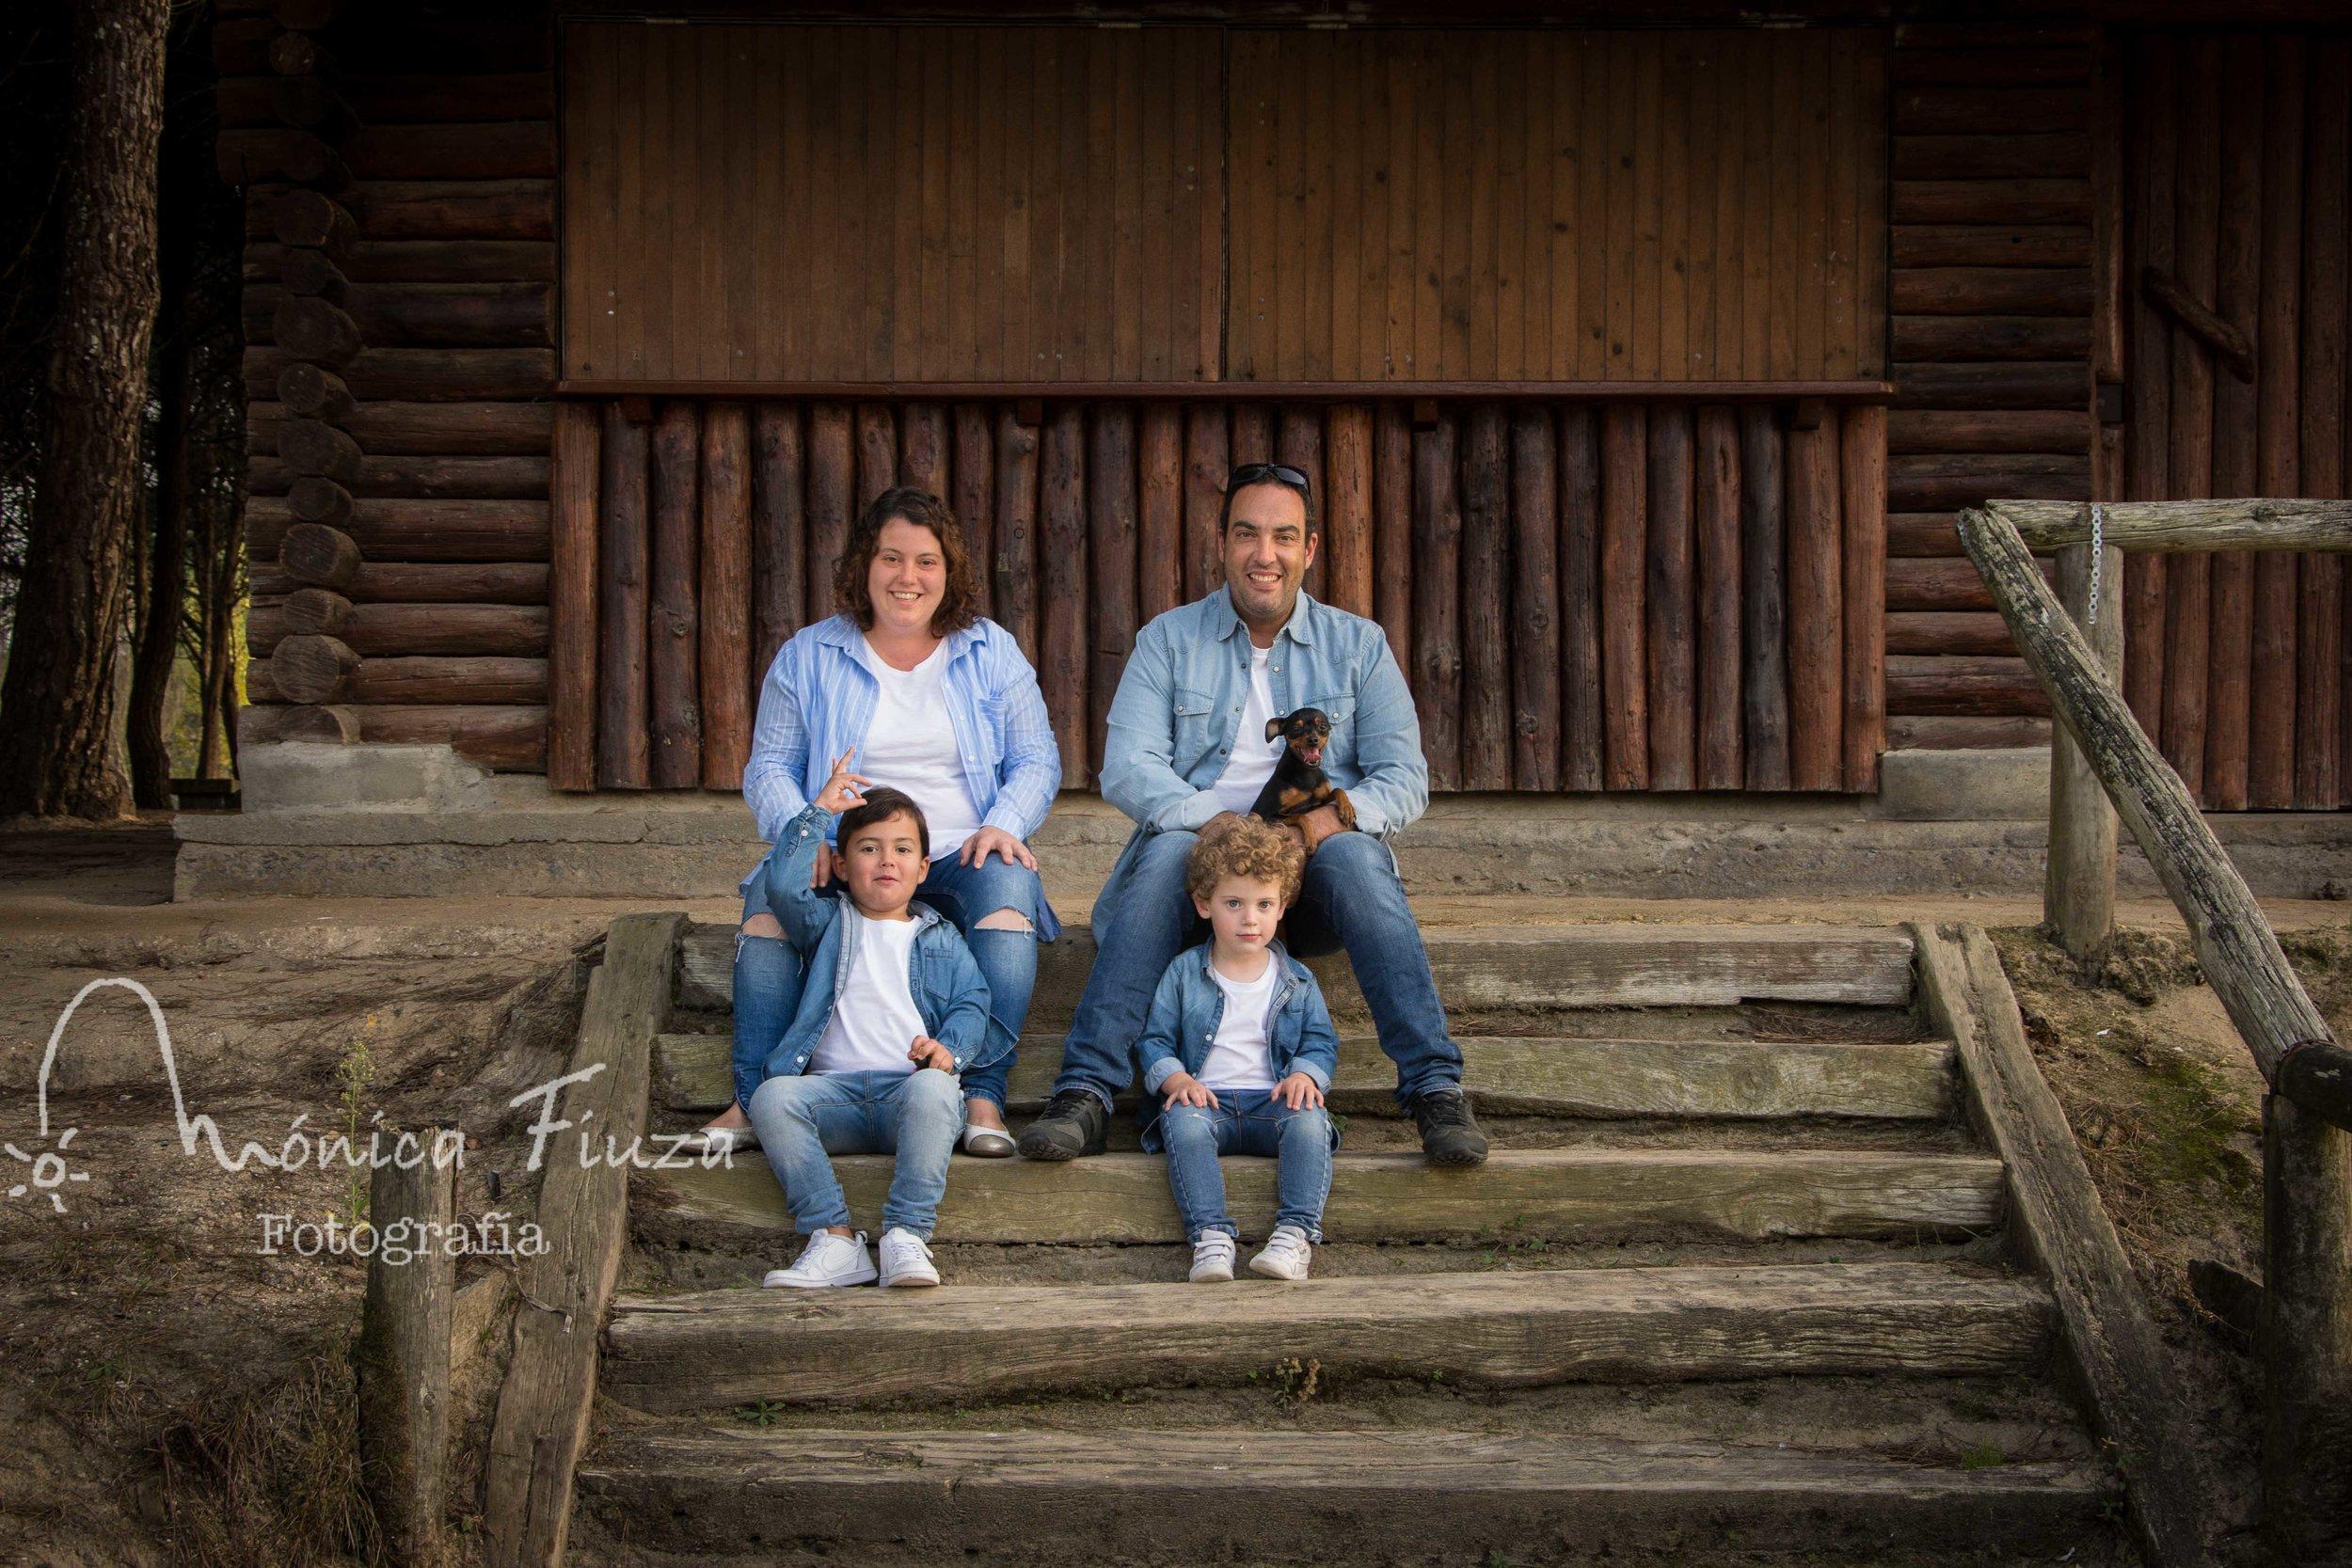 Fotografia de familia Galicia